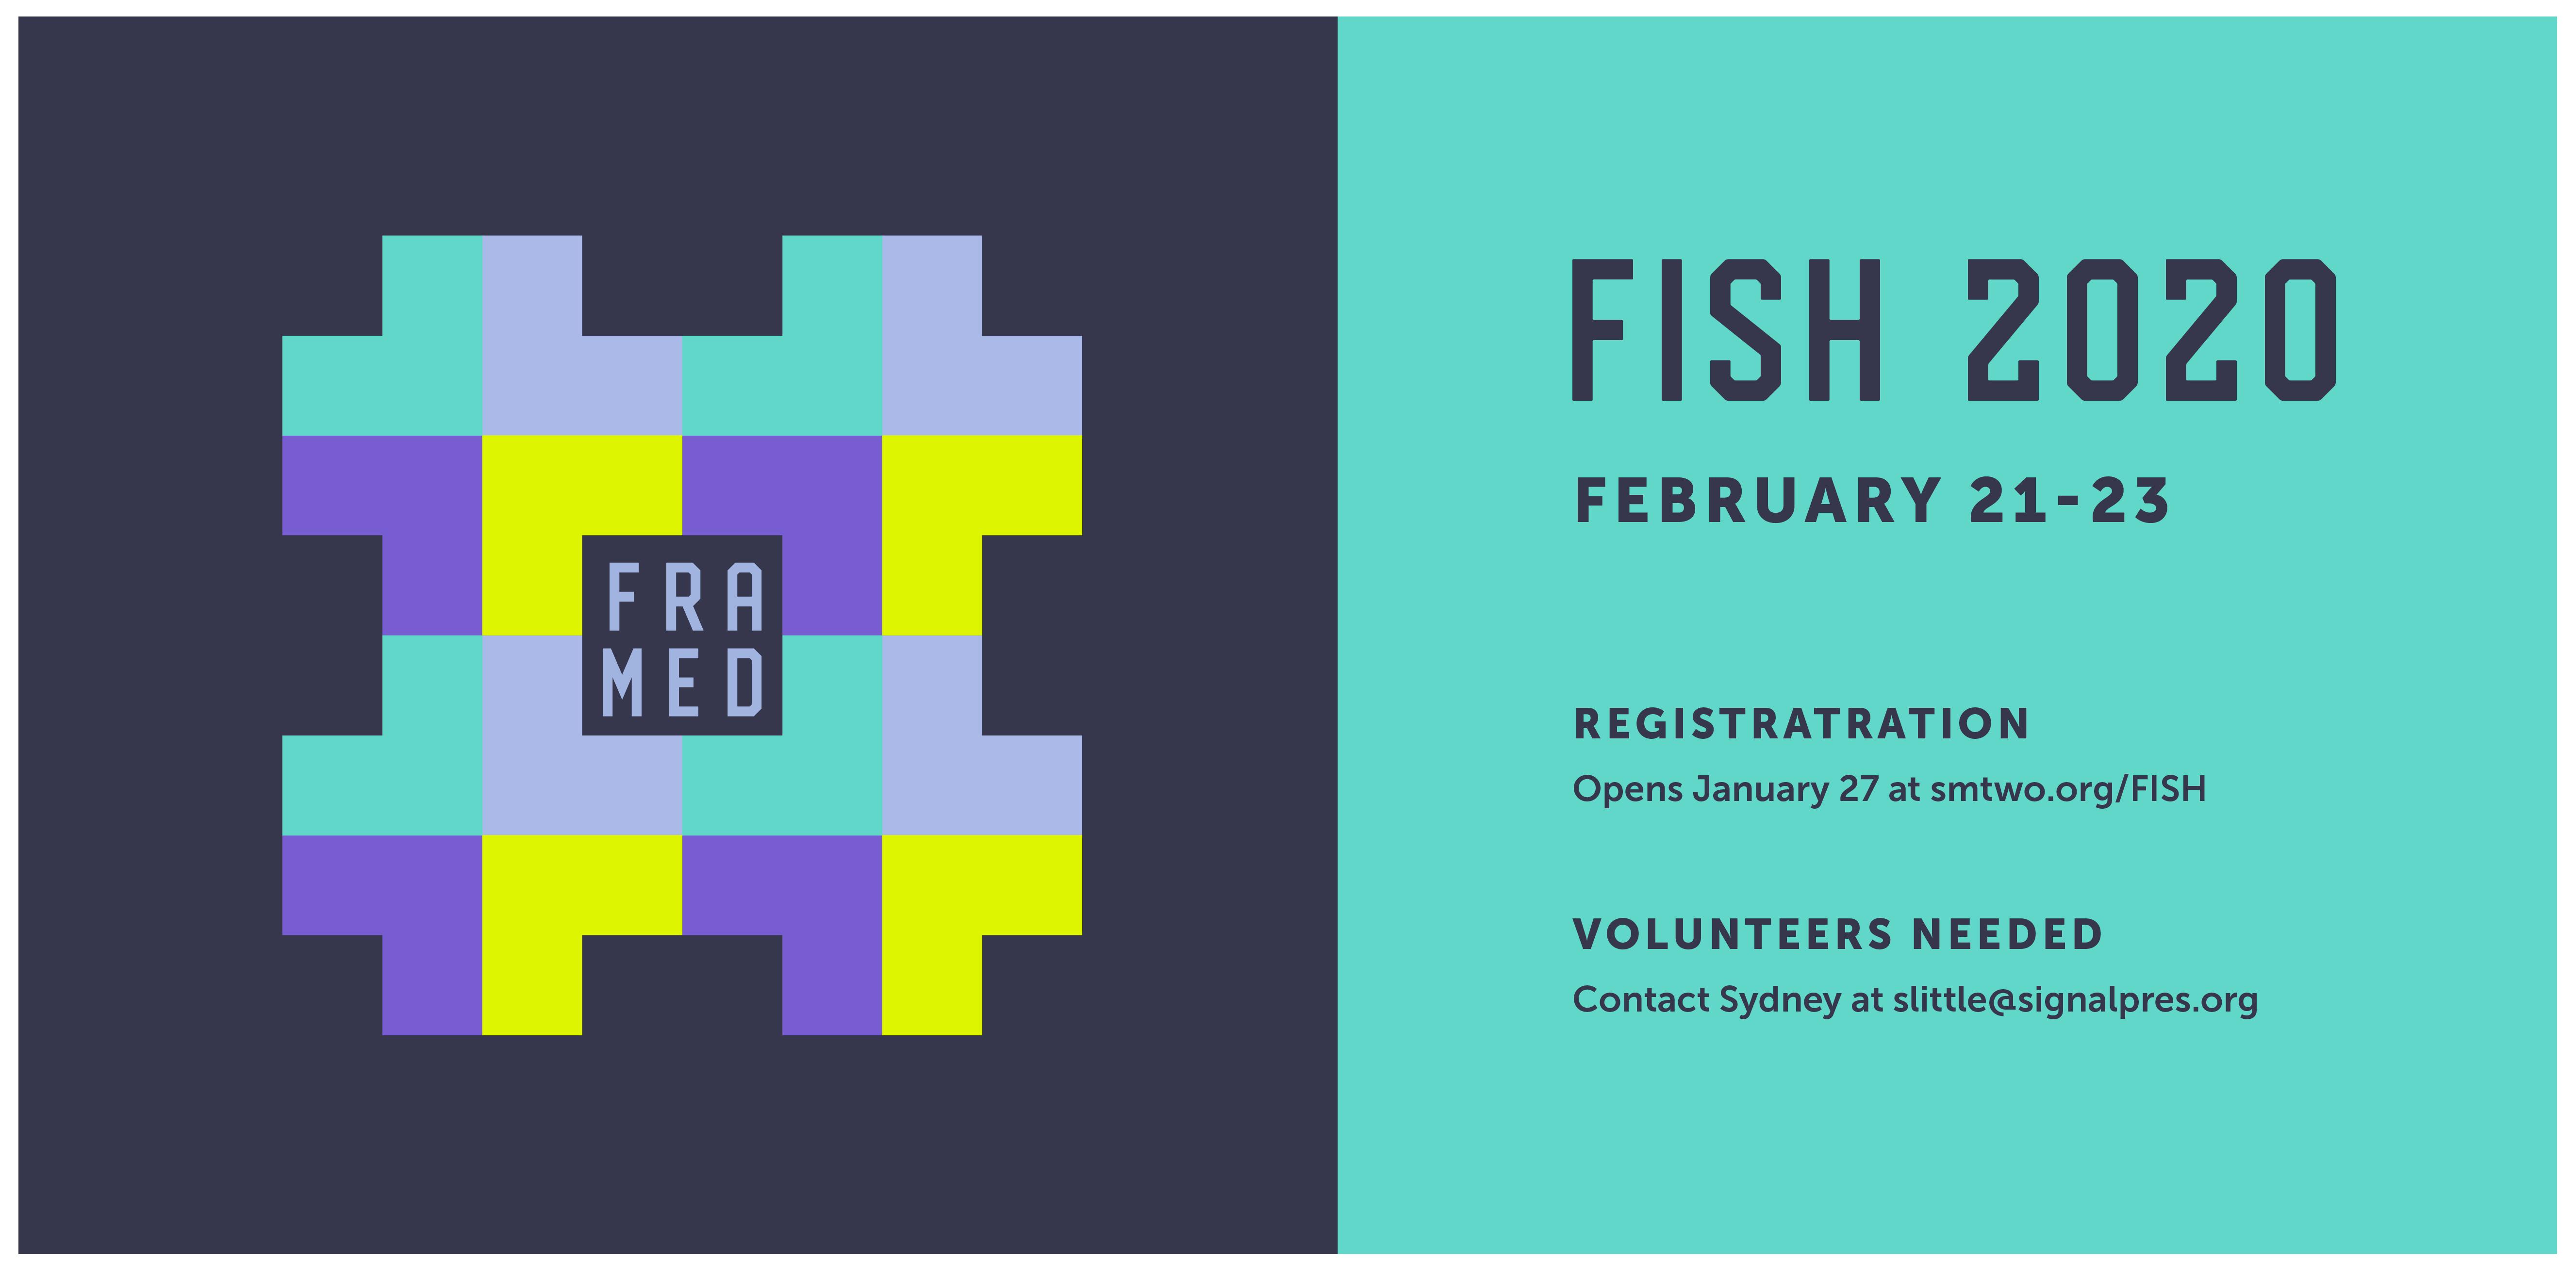 FISH 2020 Volunteers